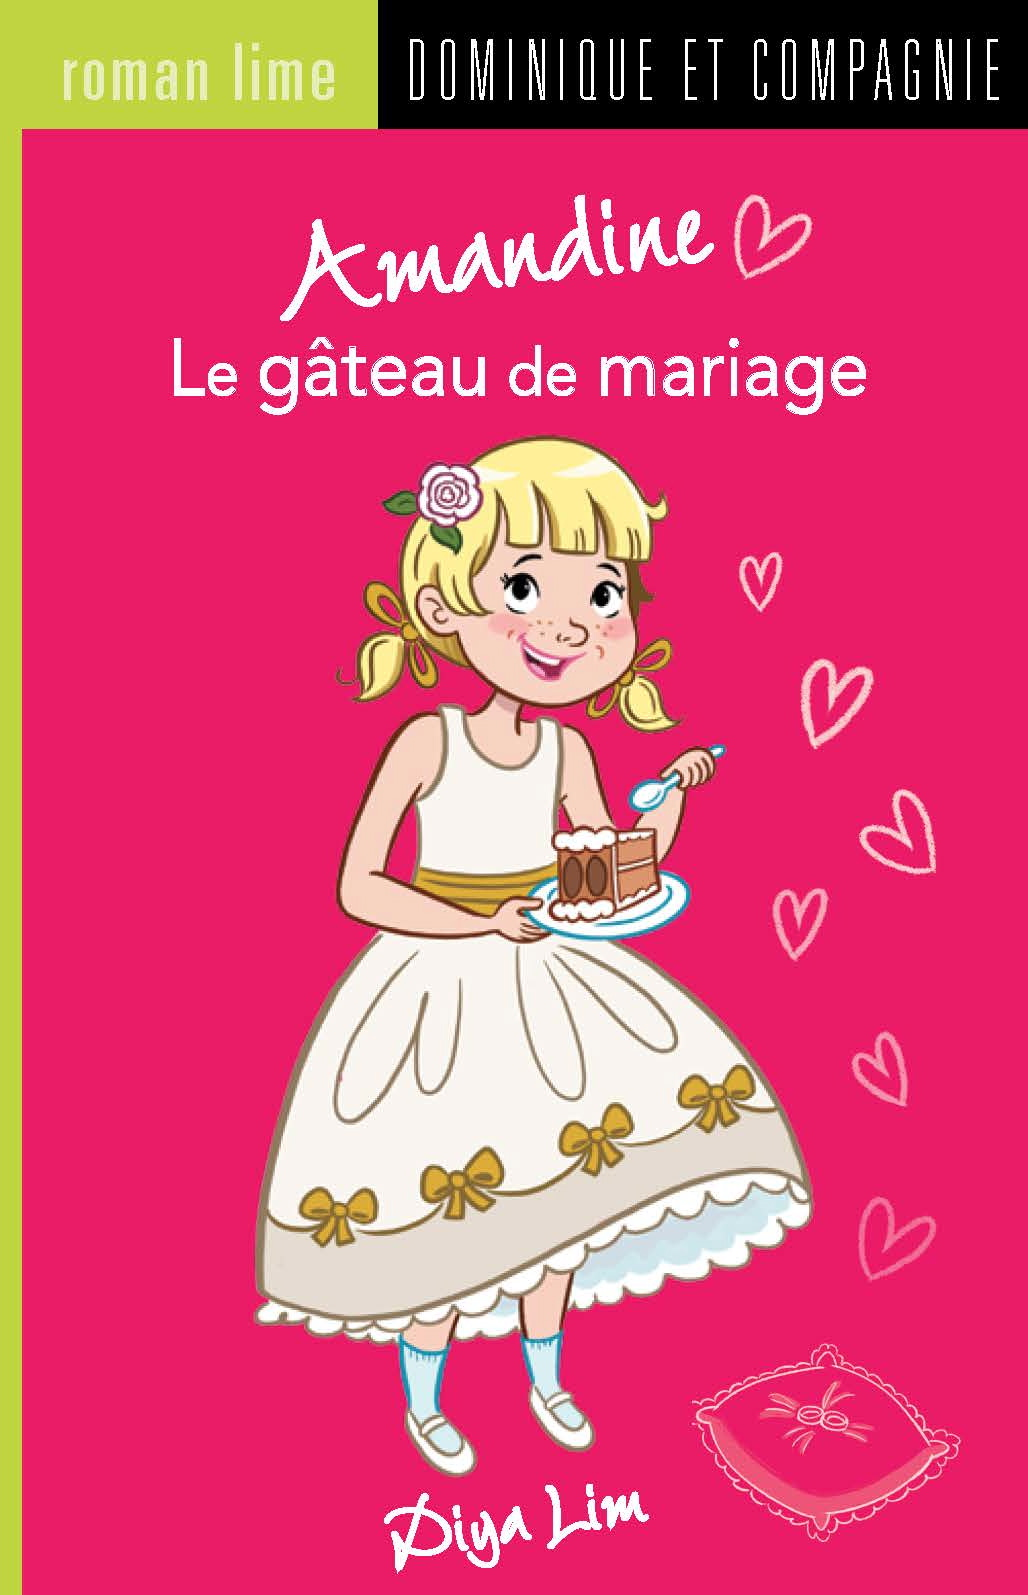 DC_RoGr_Amandine_MARIAGE-CV-2